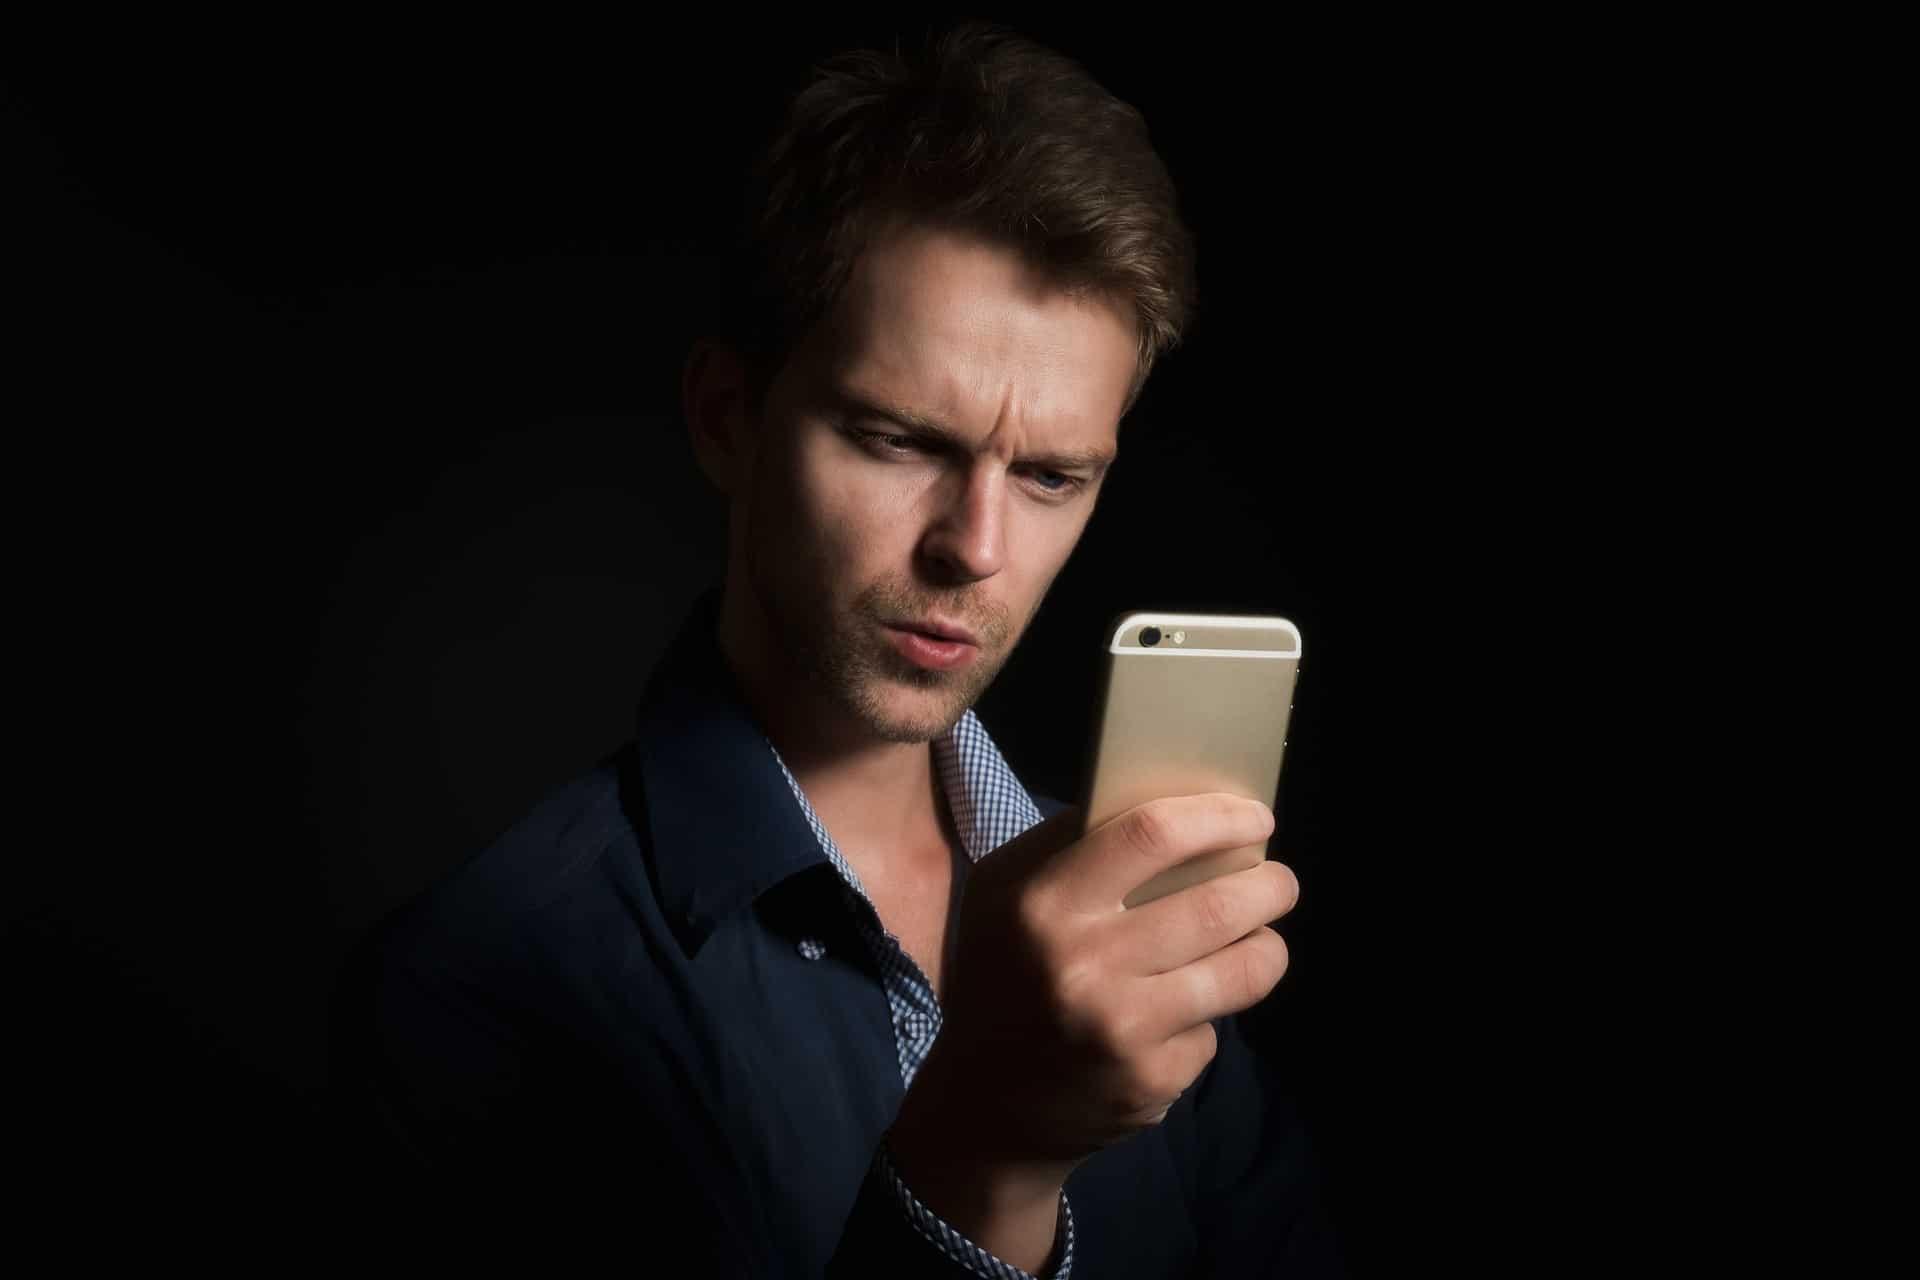 Rotherham lie detector, Northwest Polygraph Examiner, Rotherham lie detector test, infidelity, phone hacking